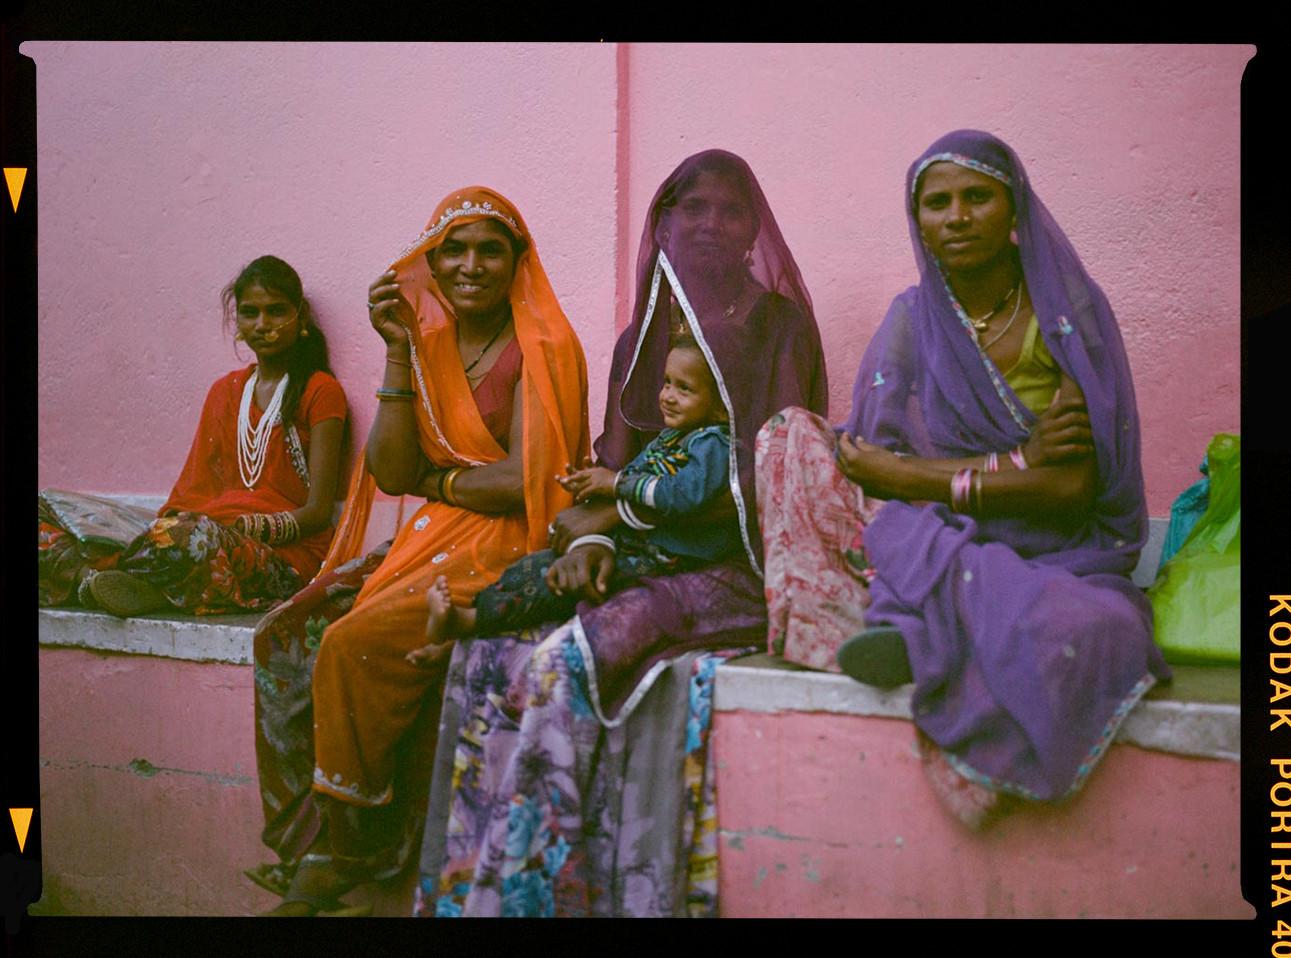 jc-india (8 of 8).jpg